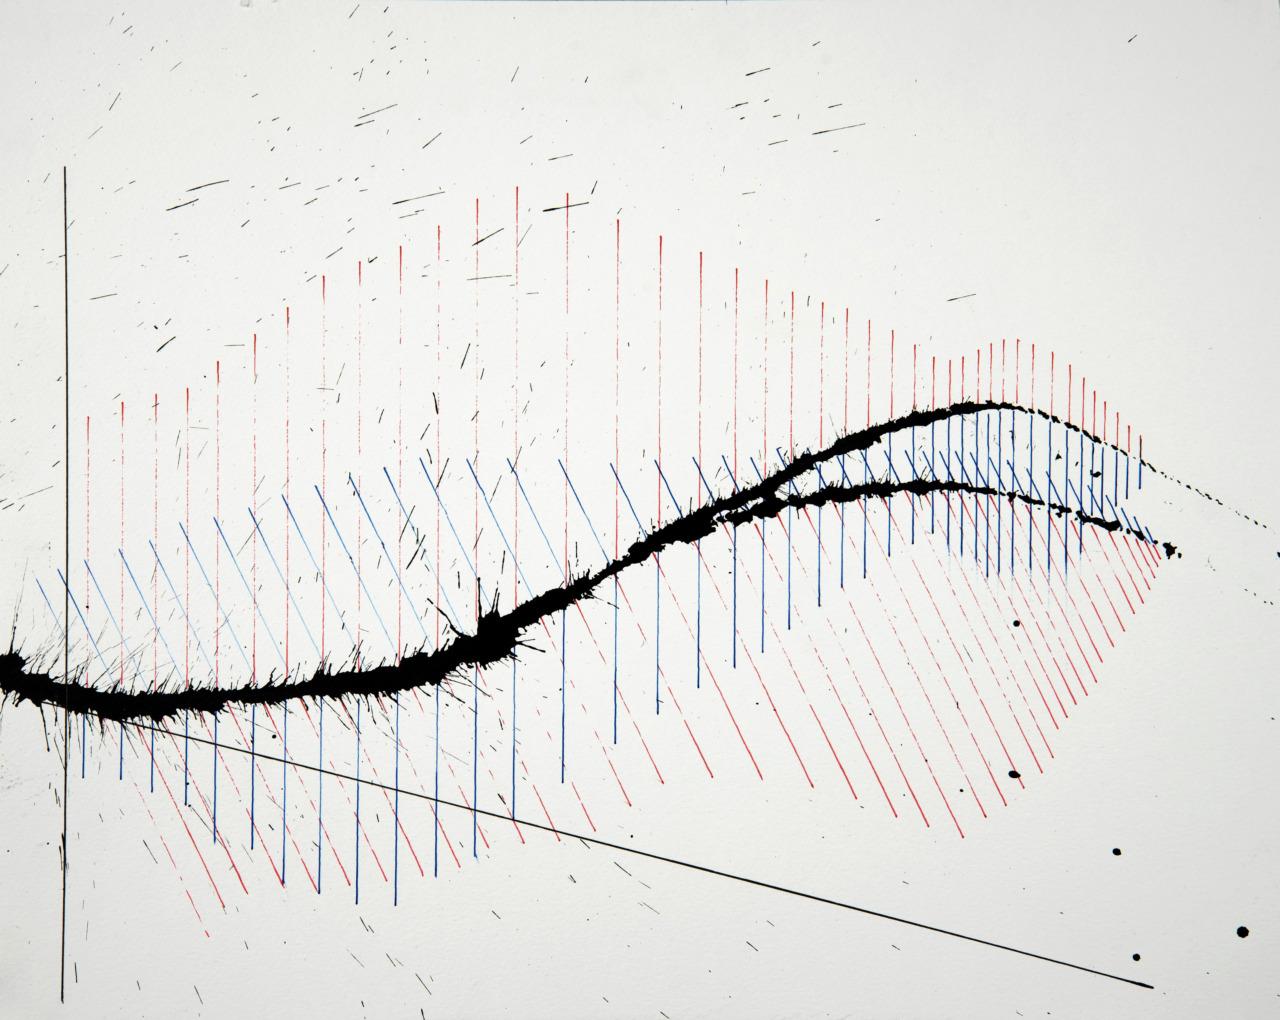 op170520. acrylic on paper. 40x50cm